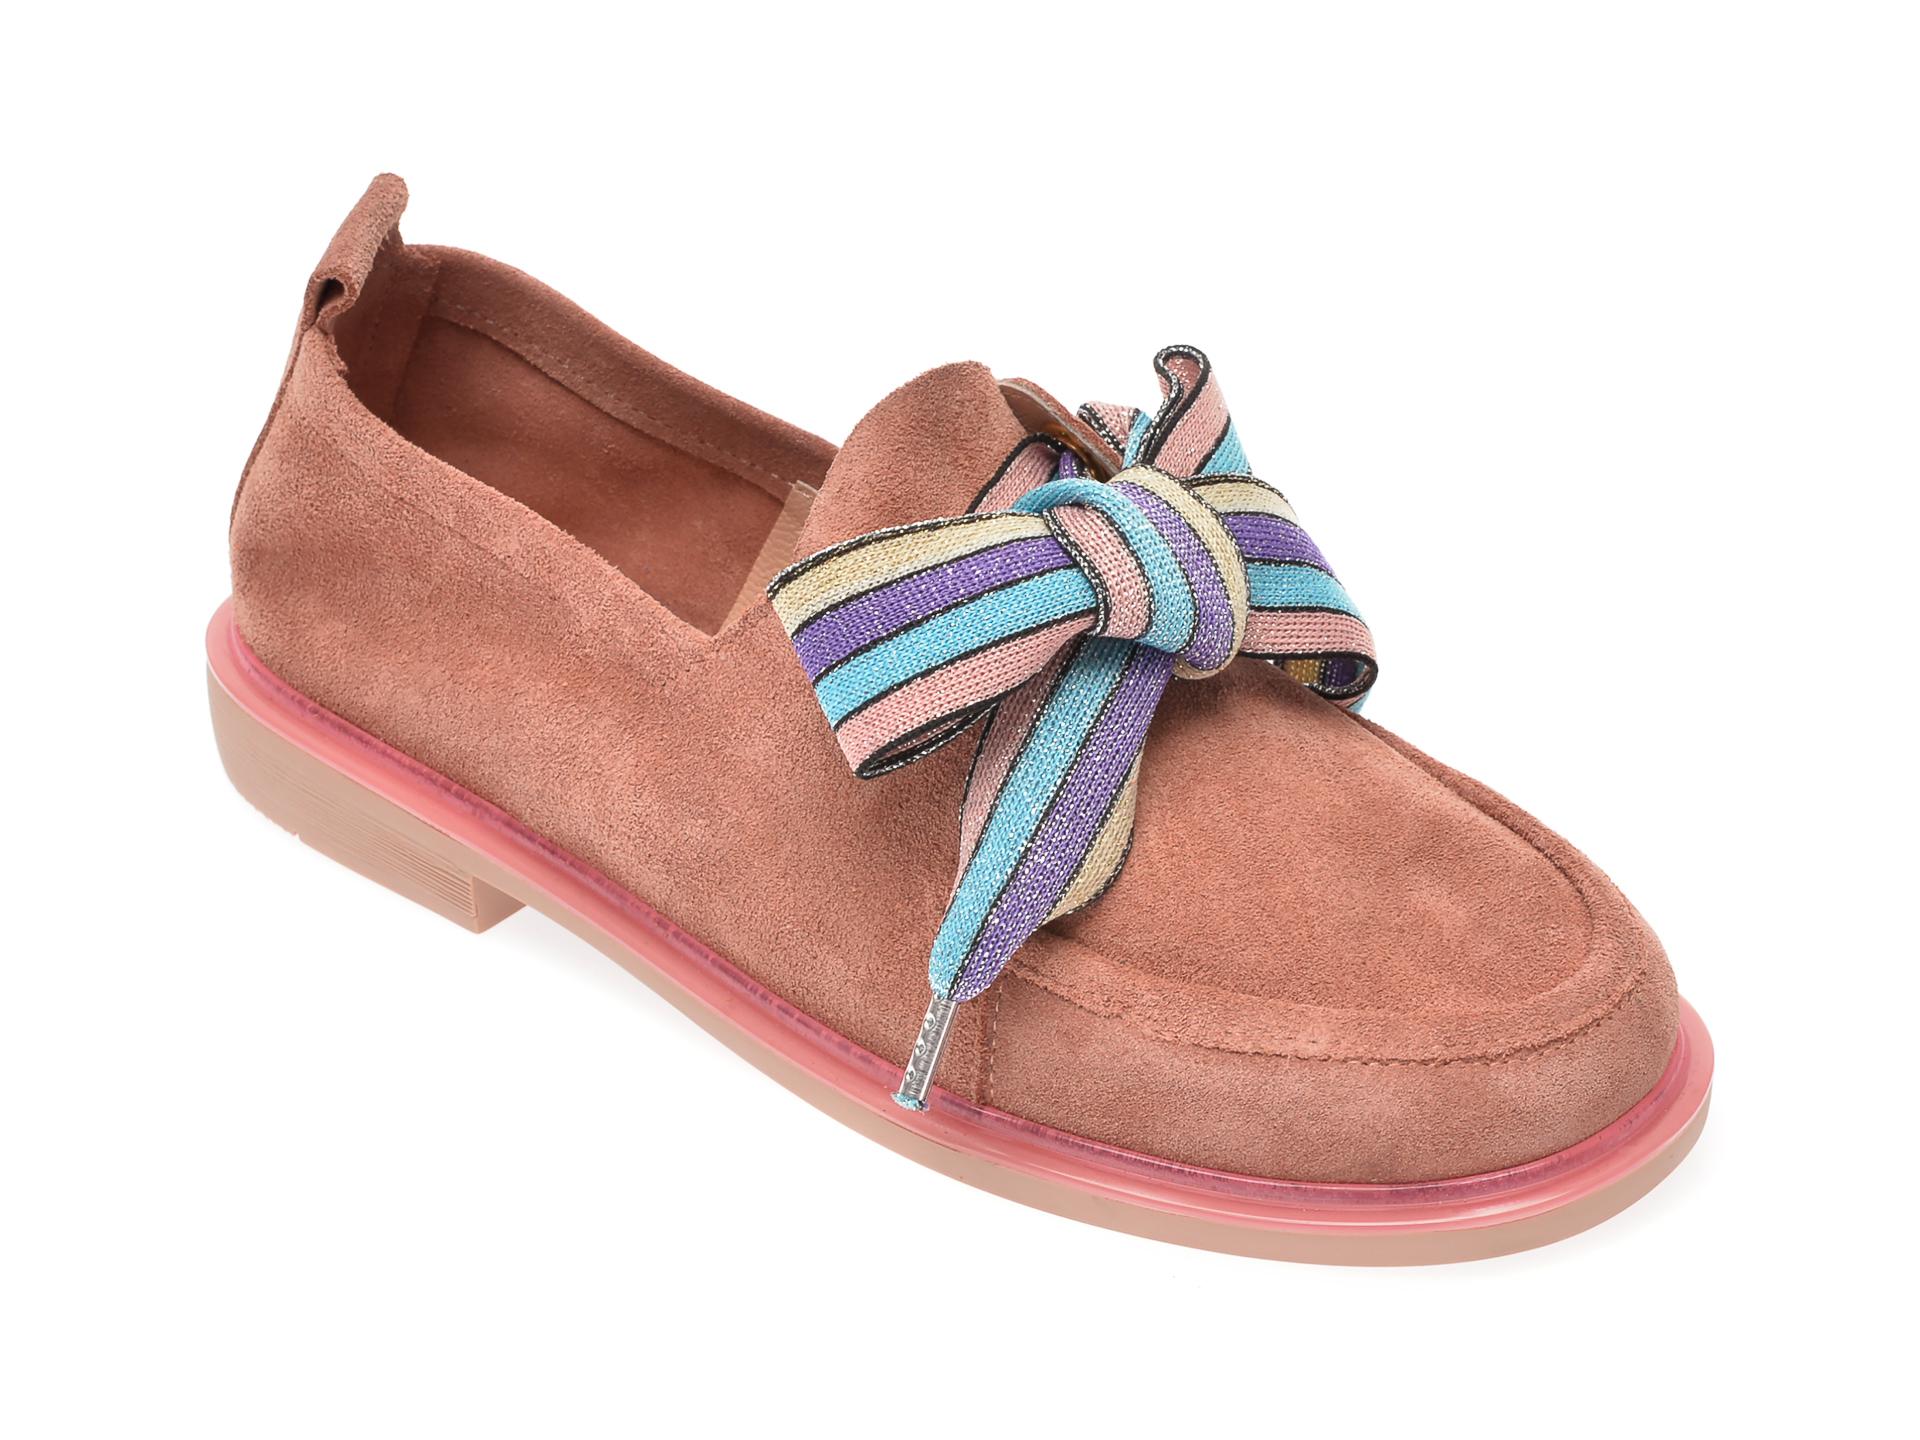 Pantofi FLAVIA PASSINI maro, 6581374, din piele intoarsa